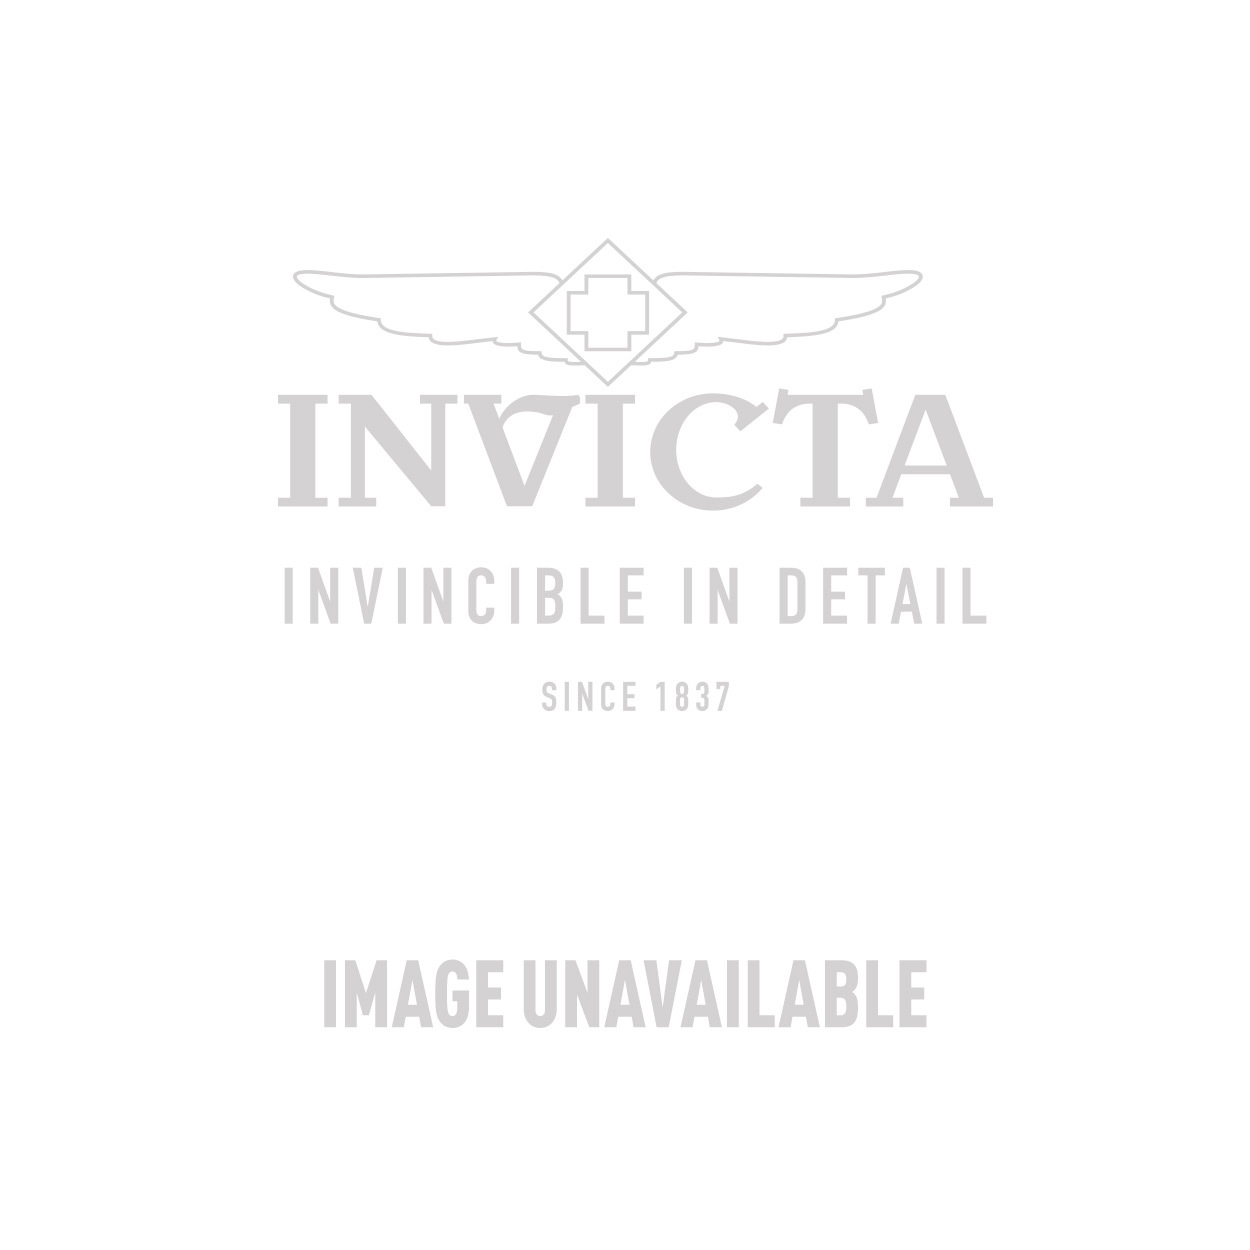 7504bdf87 Invicta Venom Mens Quartz 52.5 mm Stainless Steel, Black Case Black, Grey  Dial - Model 26134